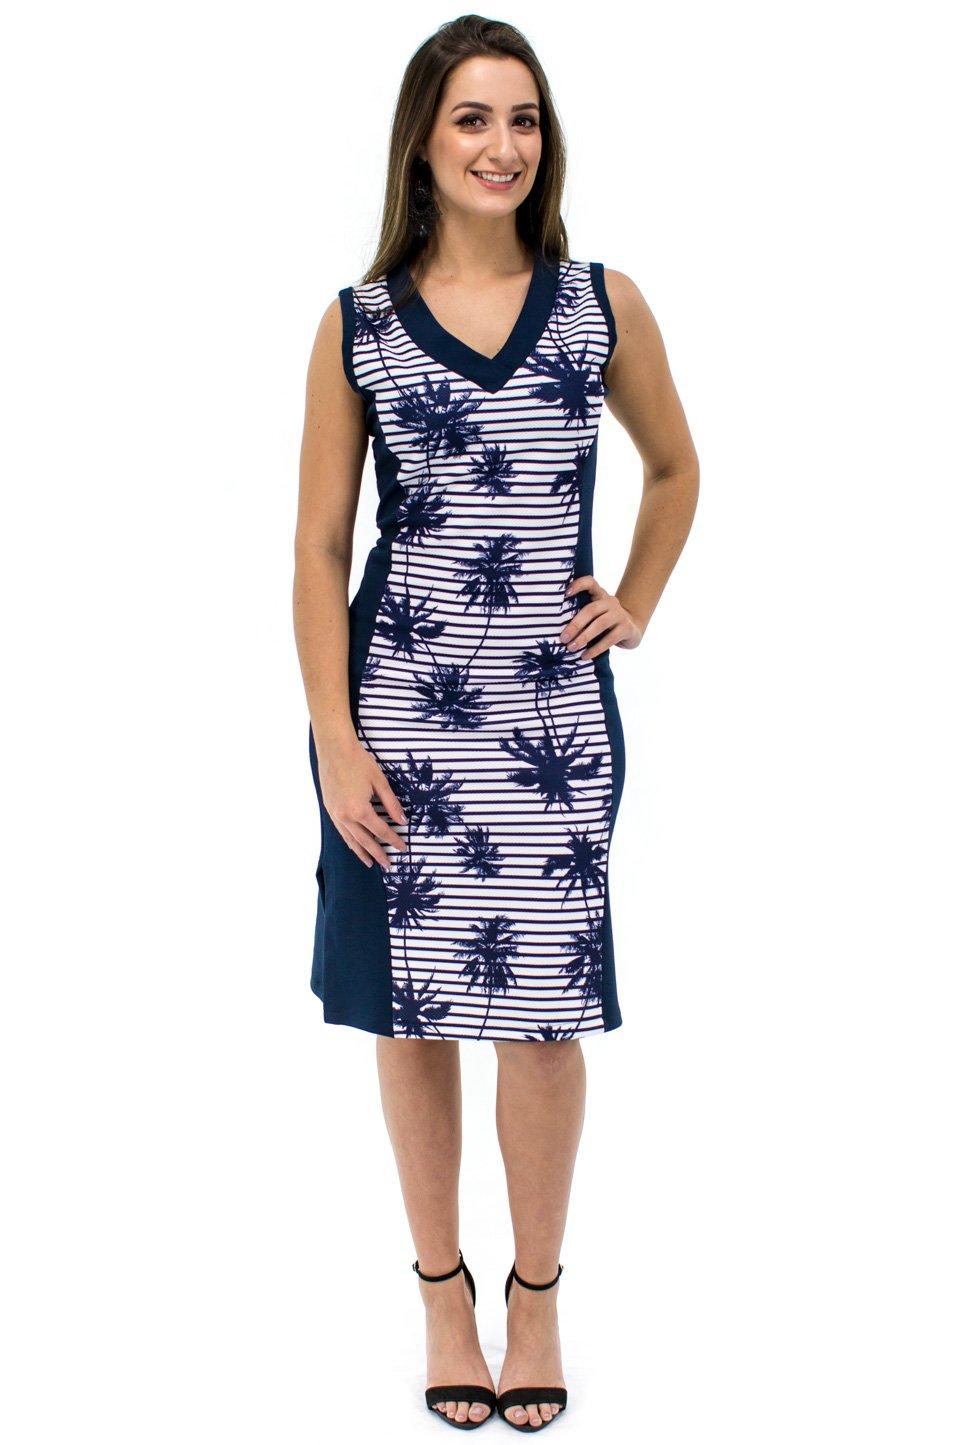 68fb1f8924 Vestido Regata Raissa Estampa Coqueiros Azul Marinho - Malharia Eliani